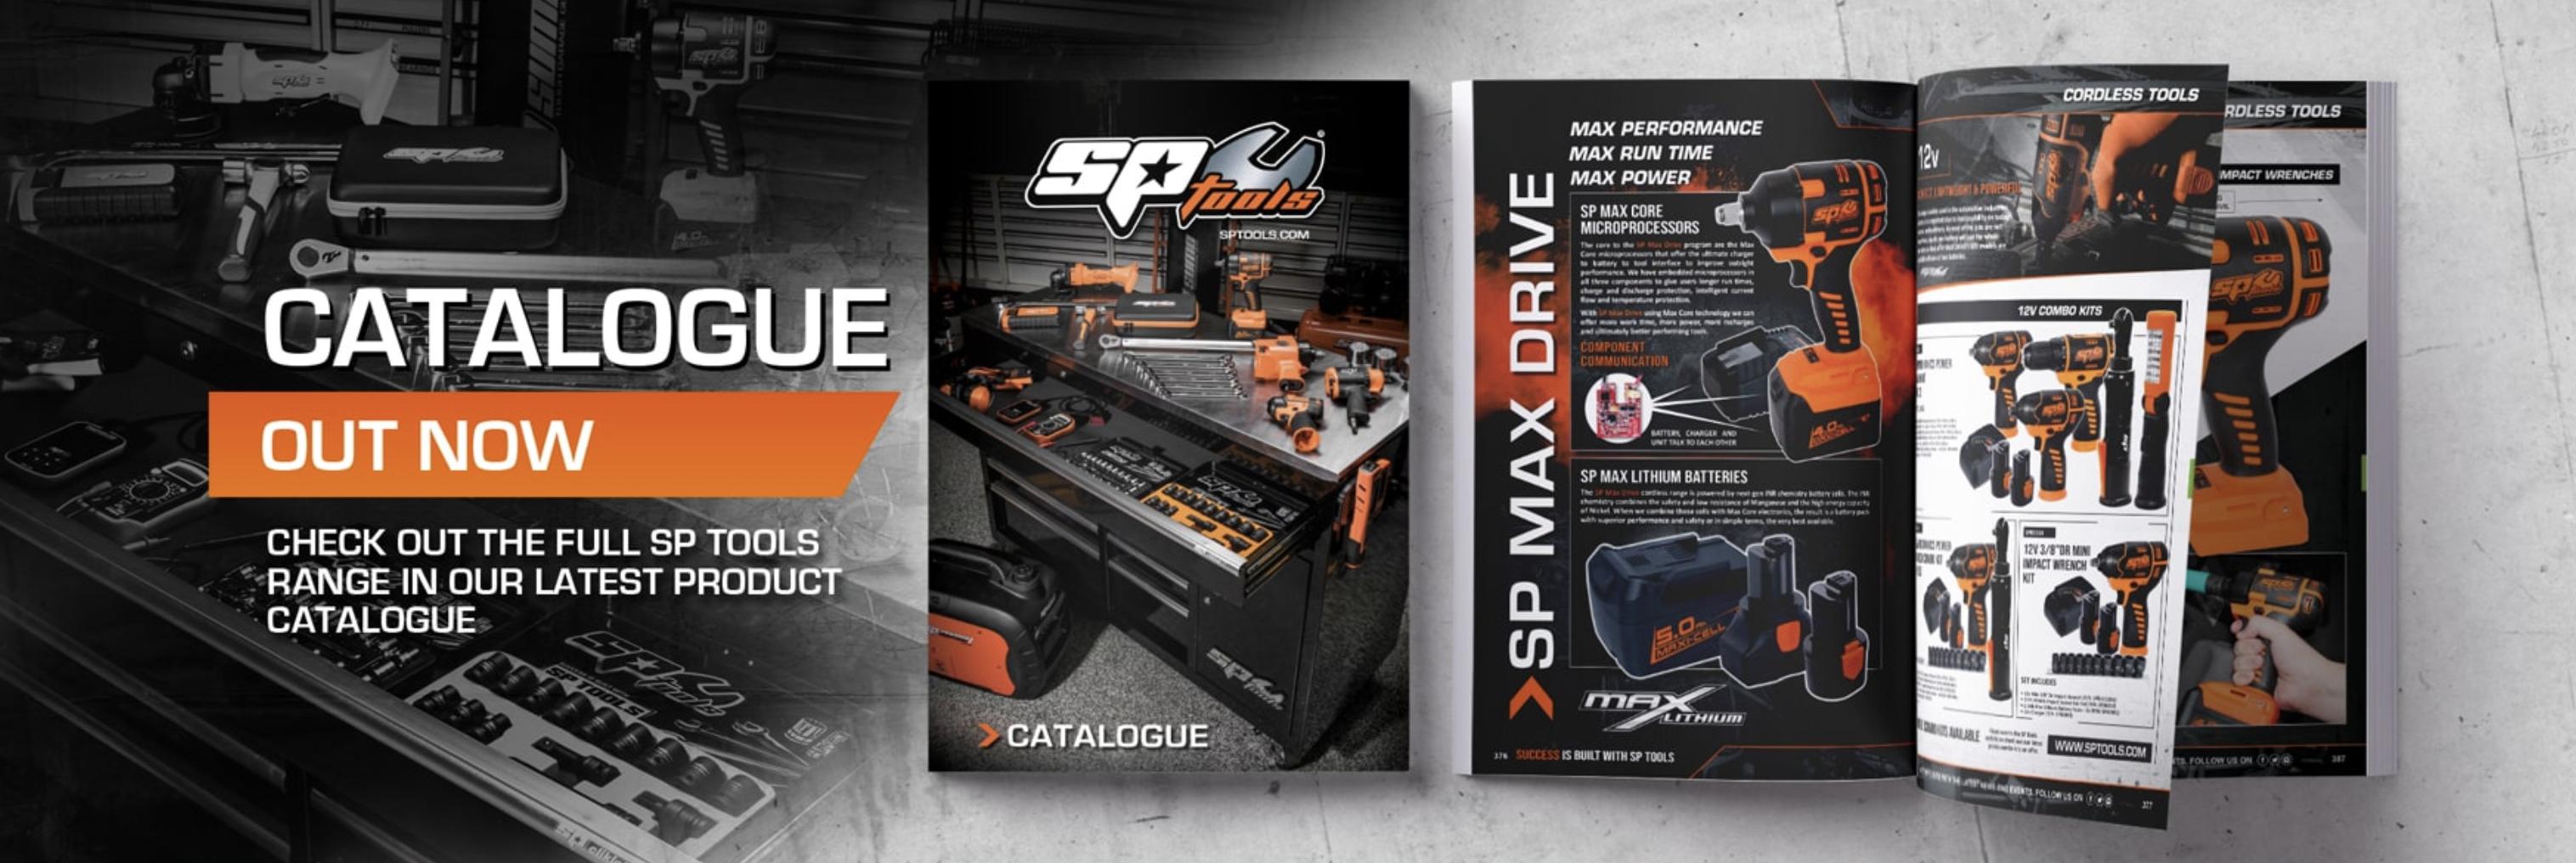 SP Tools Product Catalogue